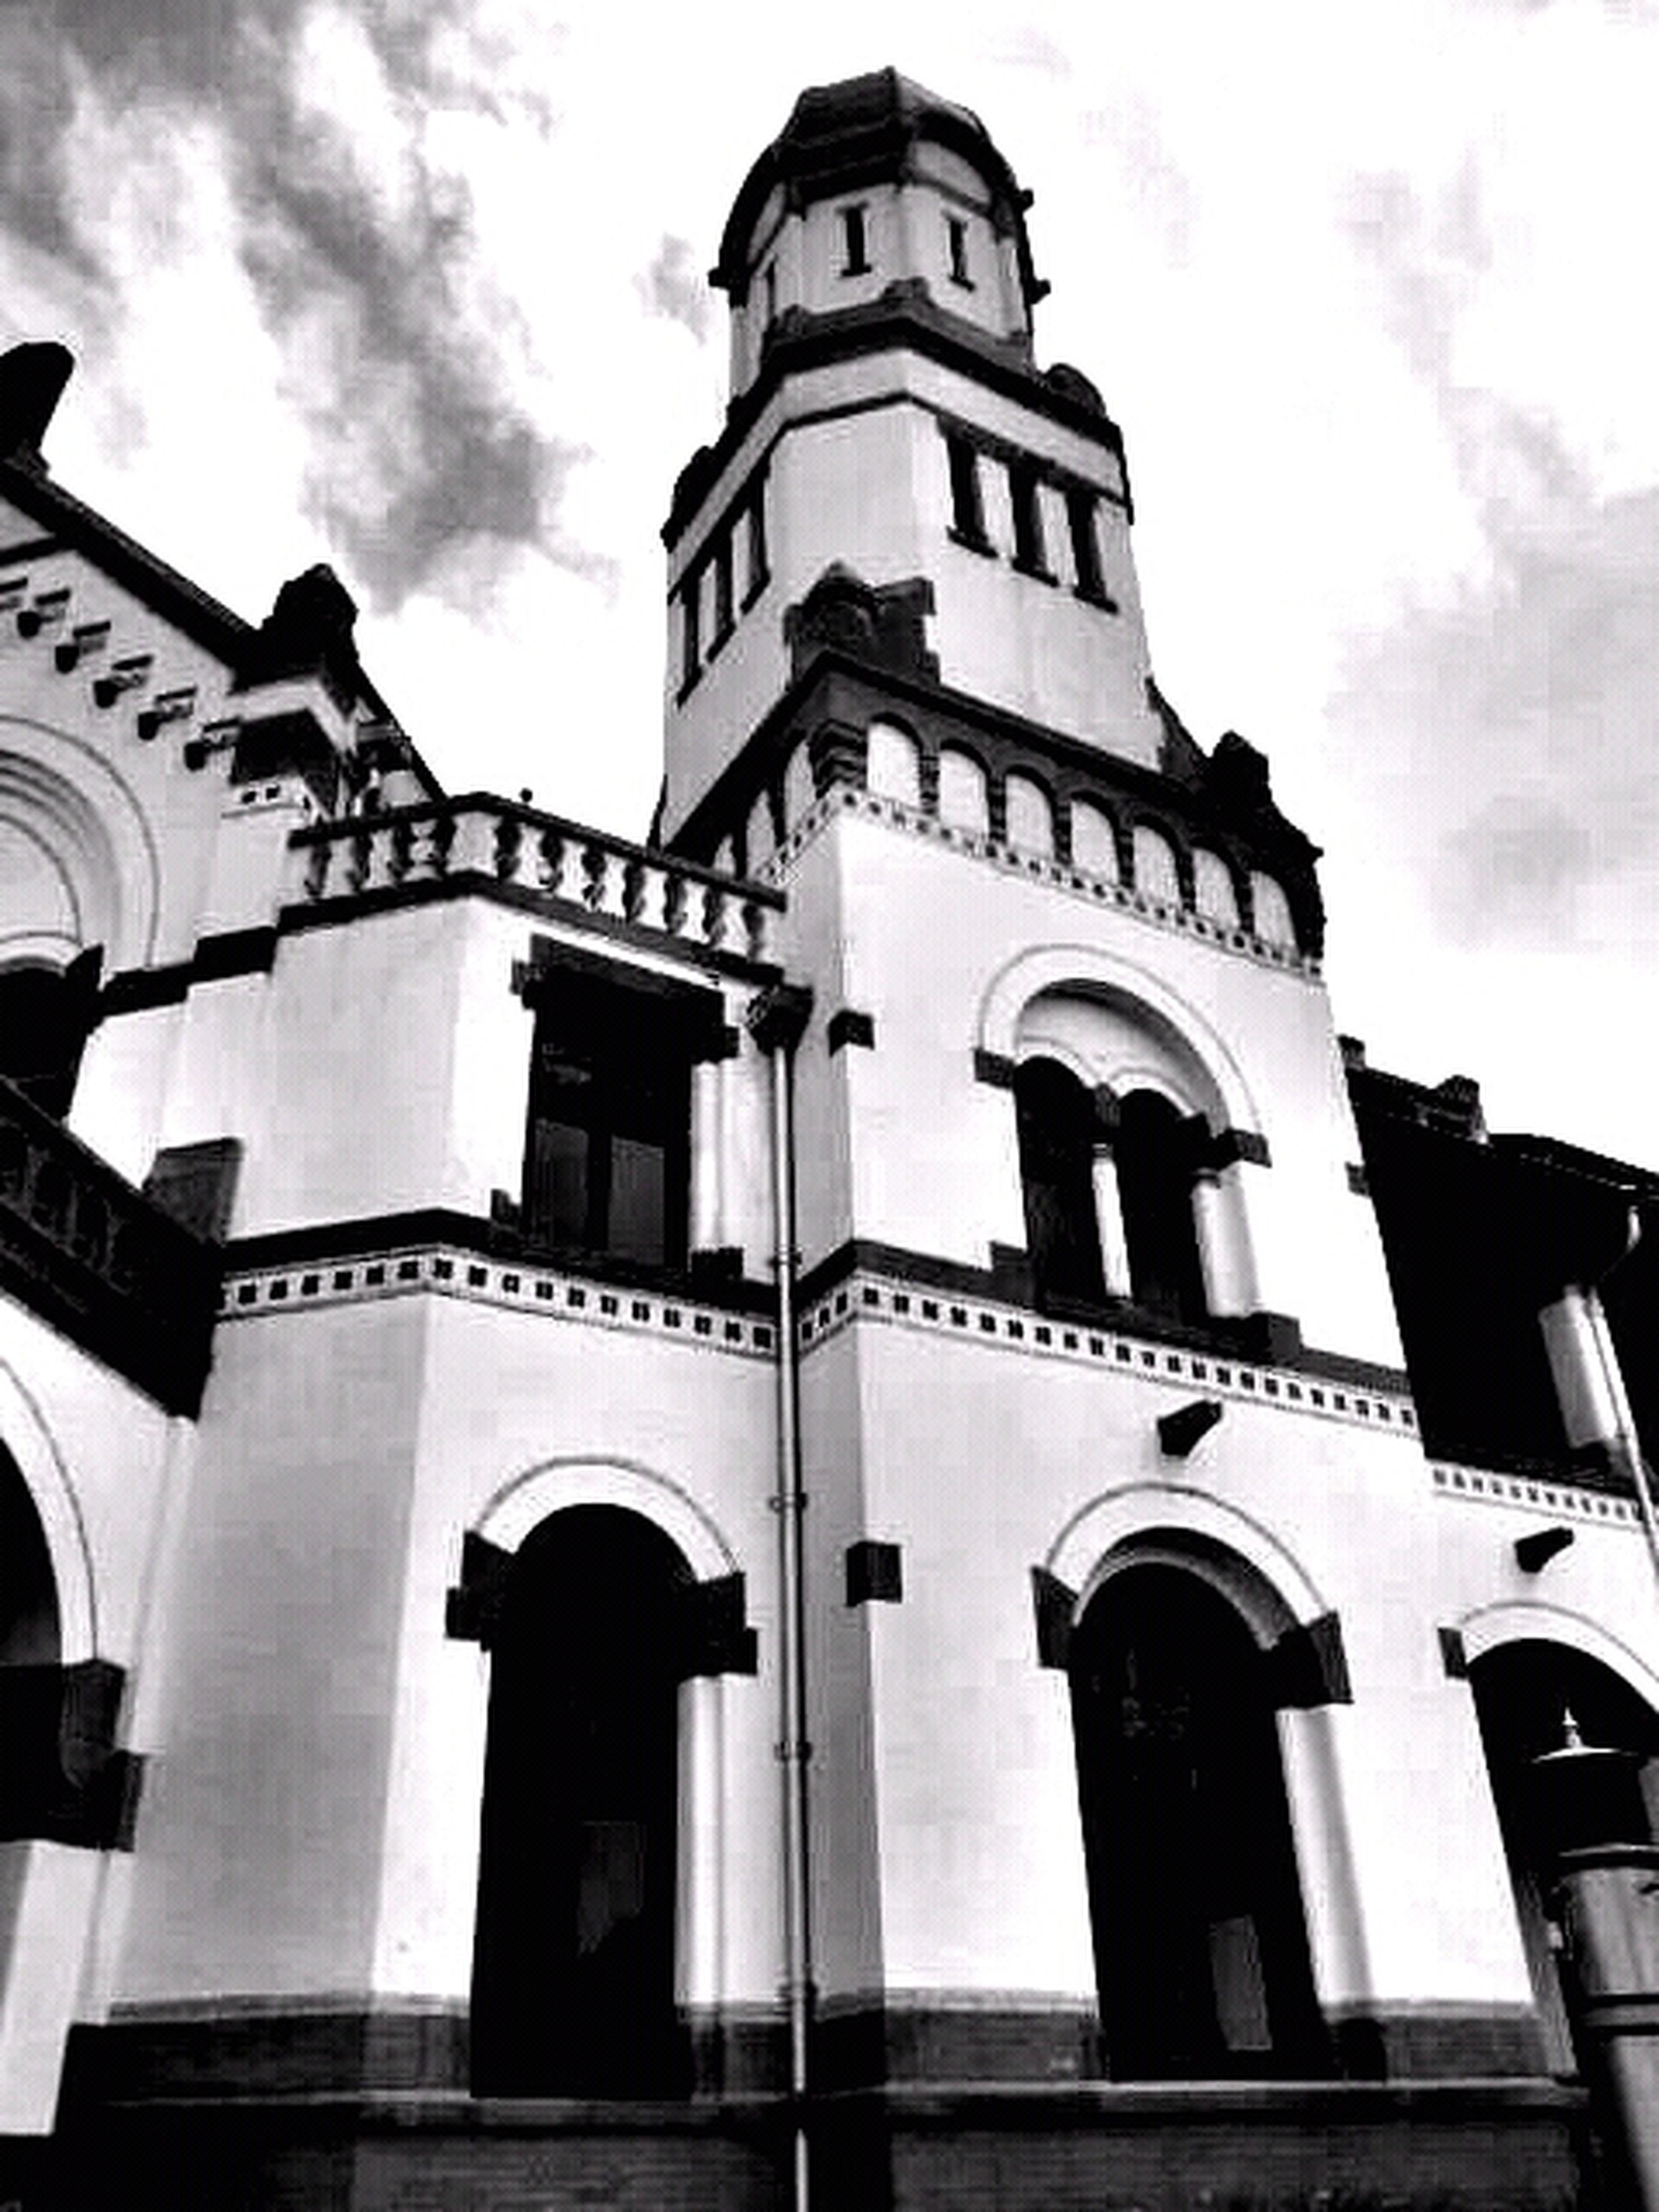 #fortheloveofblackandwhite #building #indonesia #simplicity